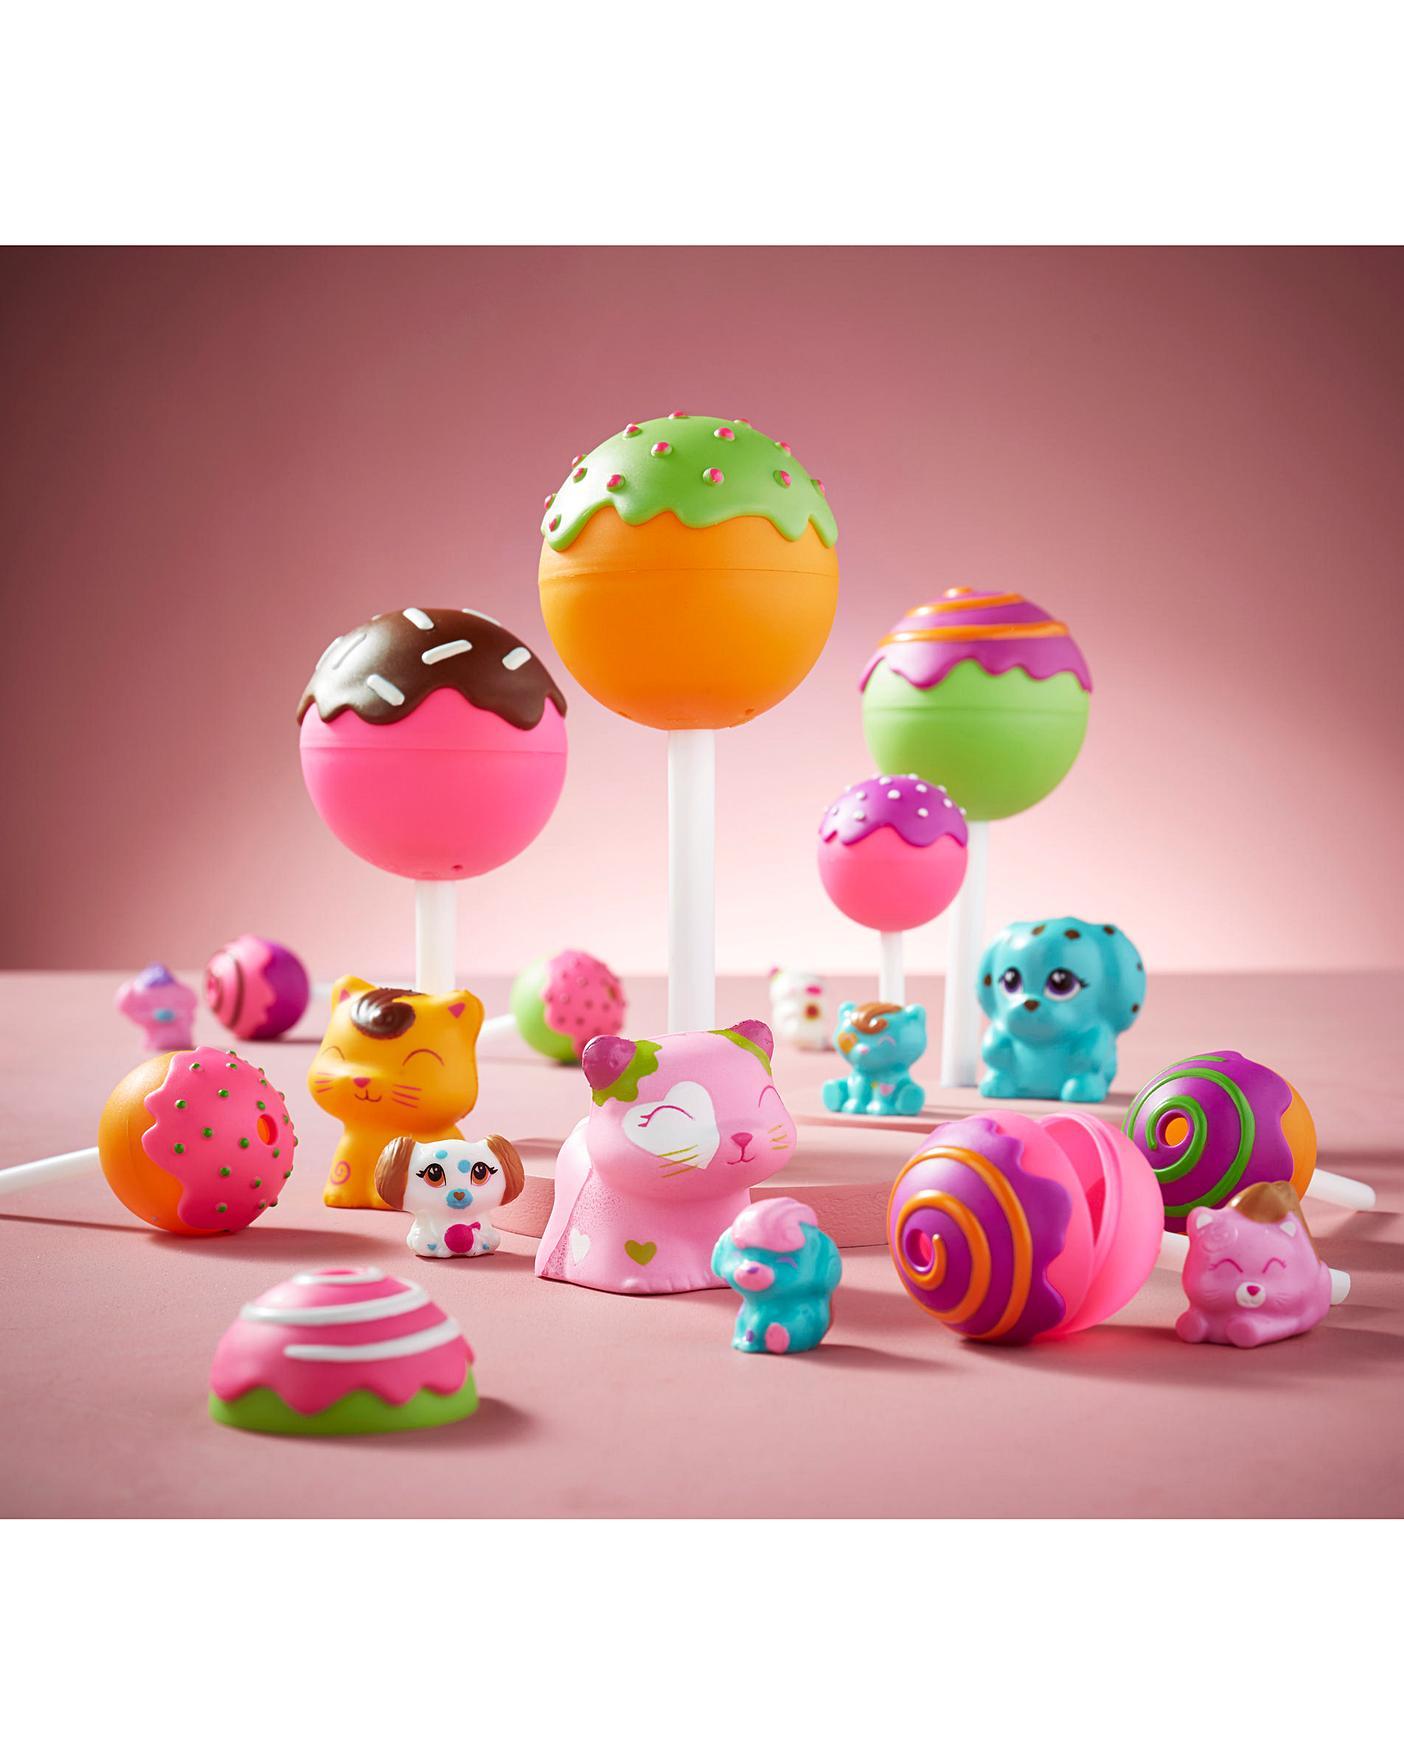 Cake Pop Cuties Cake Pop Bouquet Oxendales